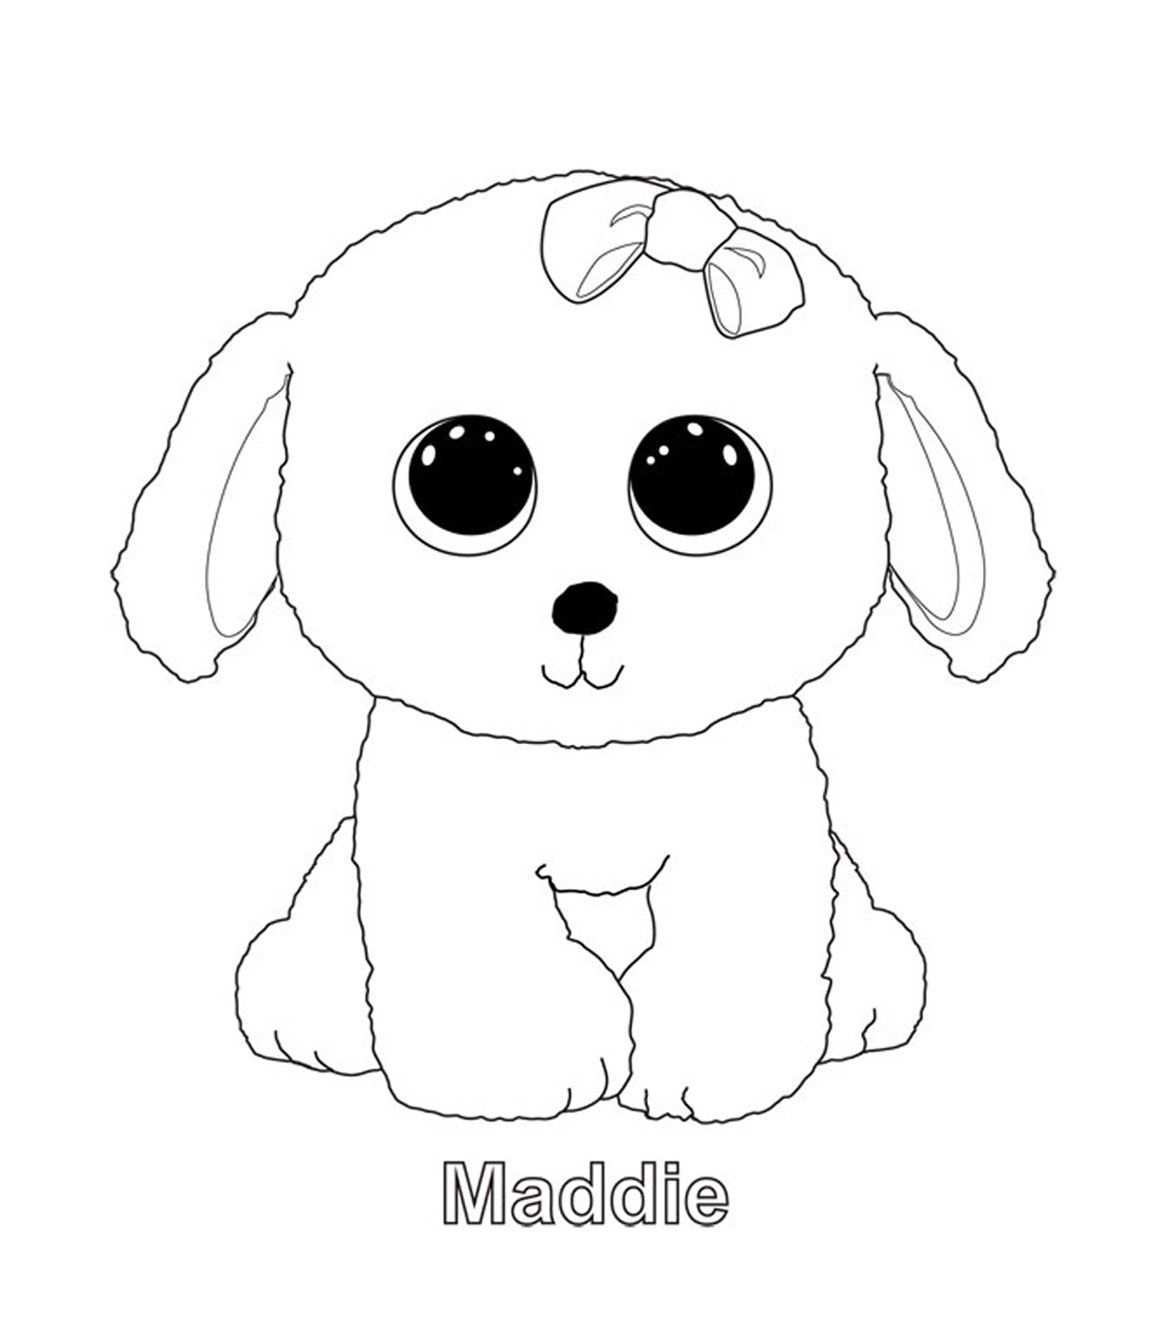 Maddie Beanie Boo Coloring Pages Beanie Boo Dogs Puppy Coloring Pages Dog Coloring Page